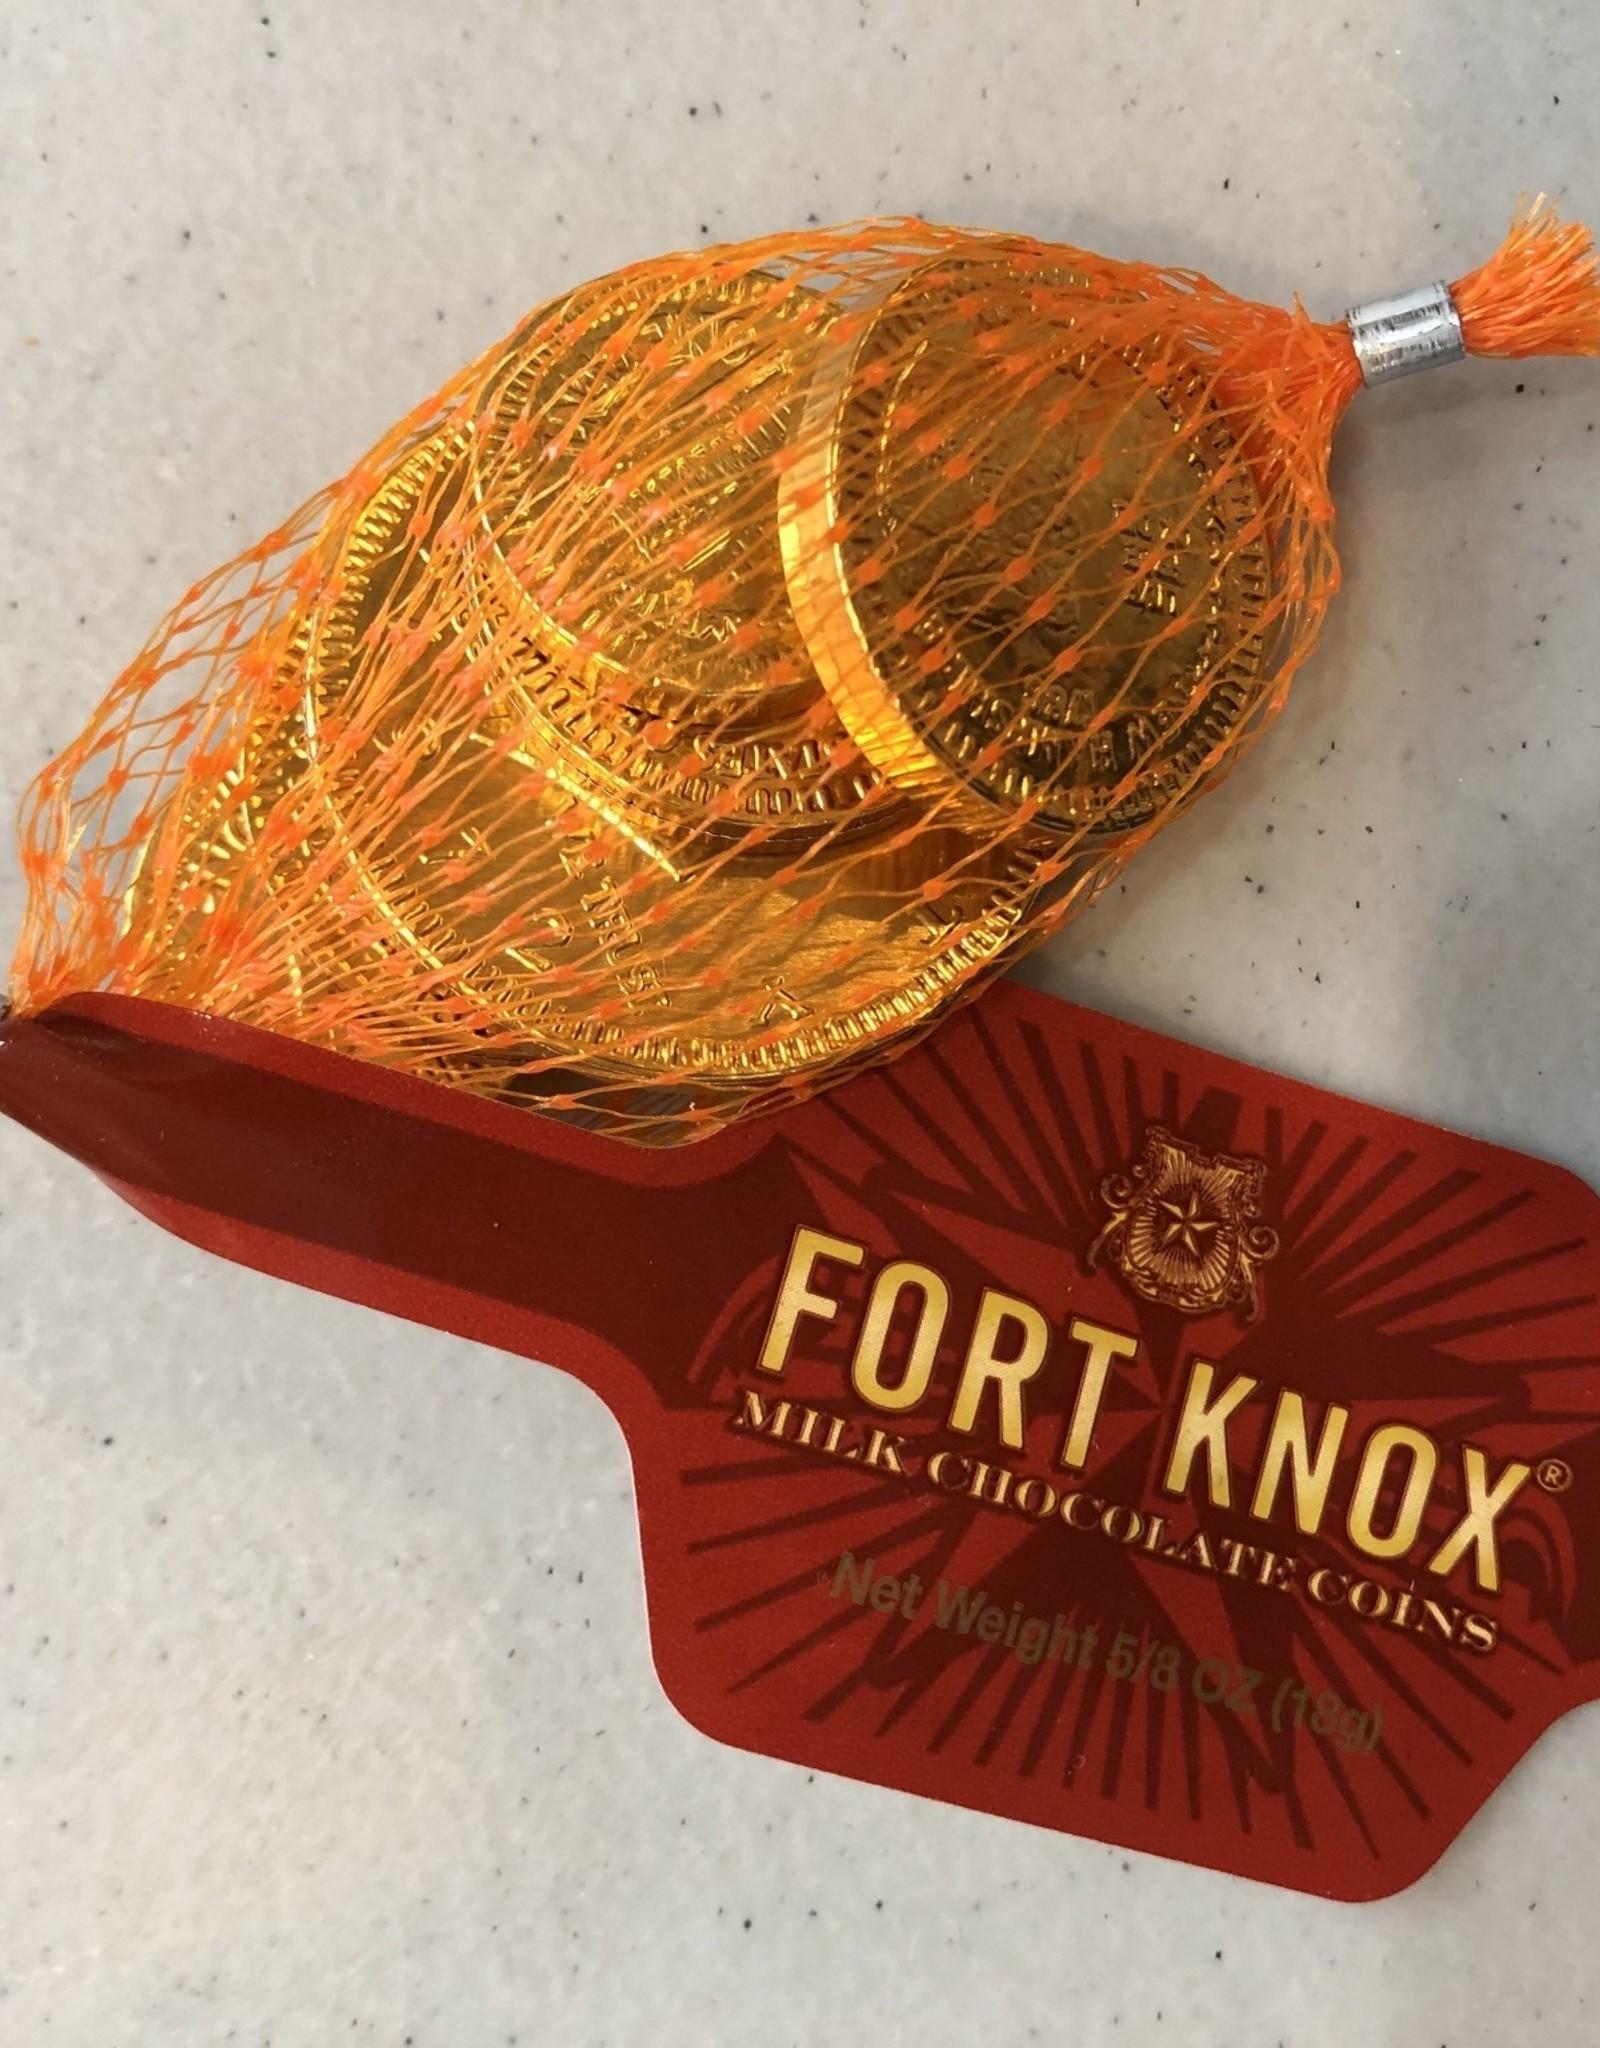 Gerrit J. Verburg Company Fort Knox Gold Coins